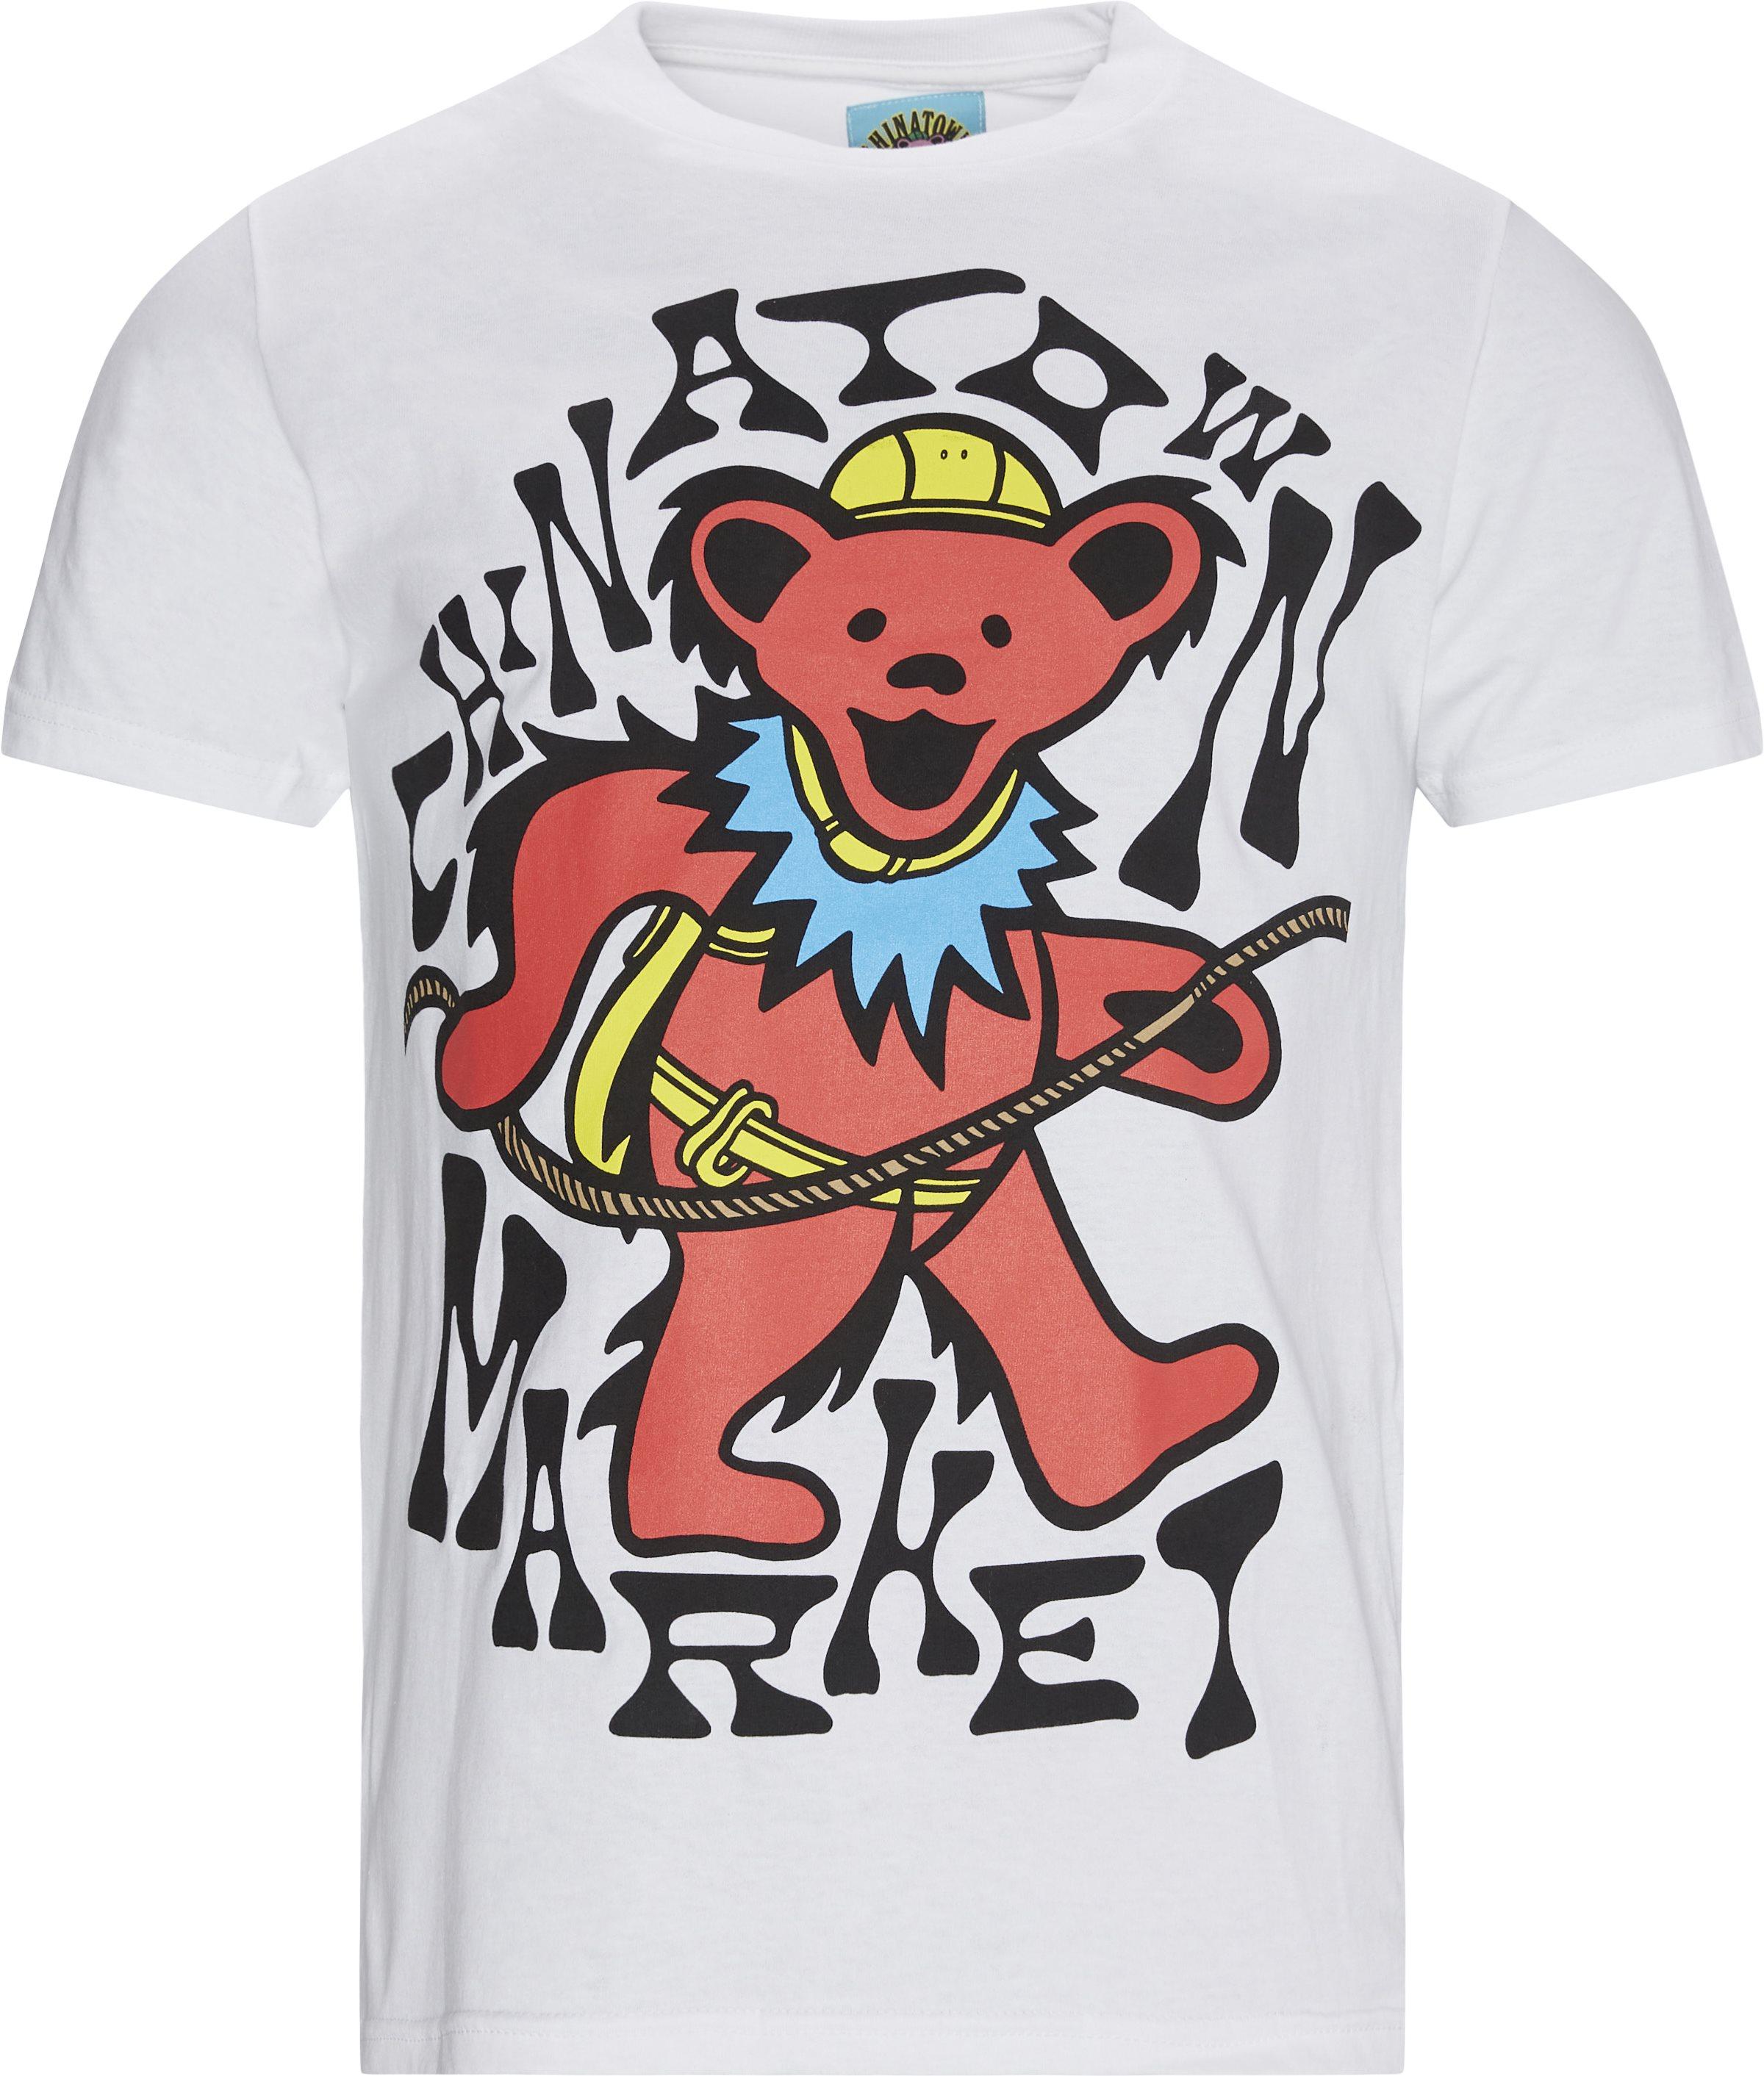 On Death Tee - T-shirts - Regular fit - Hvid